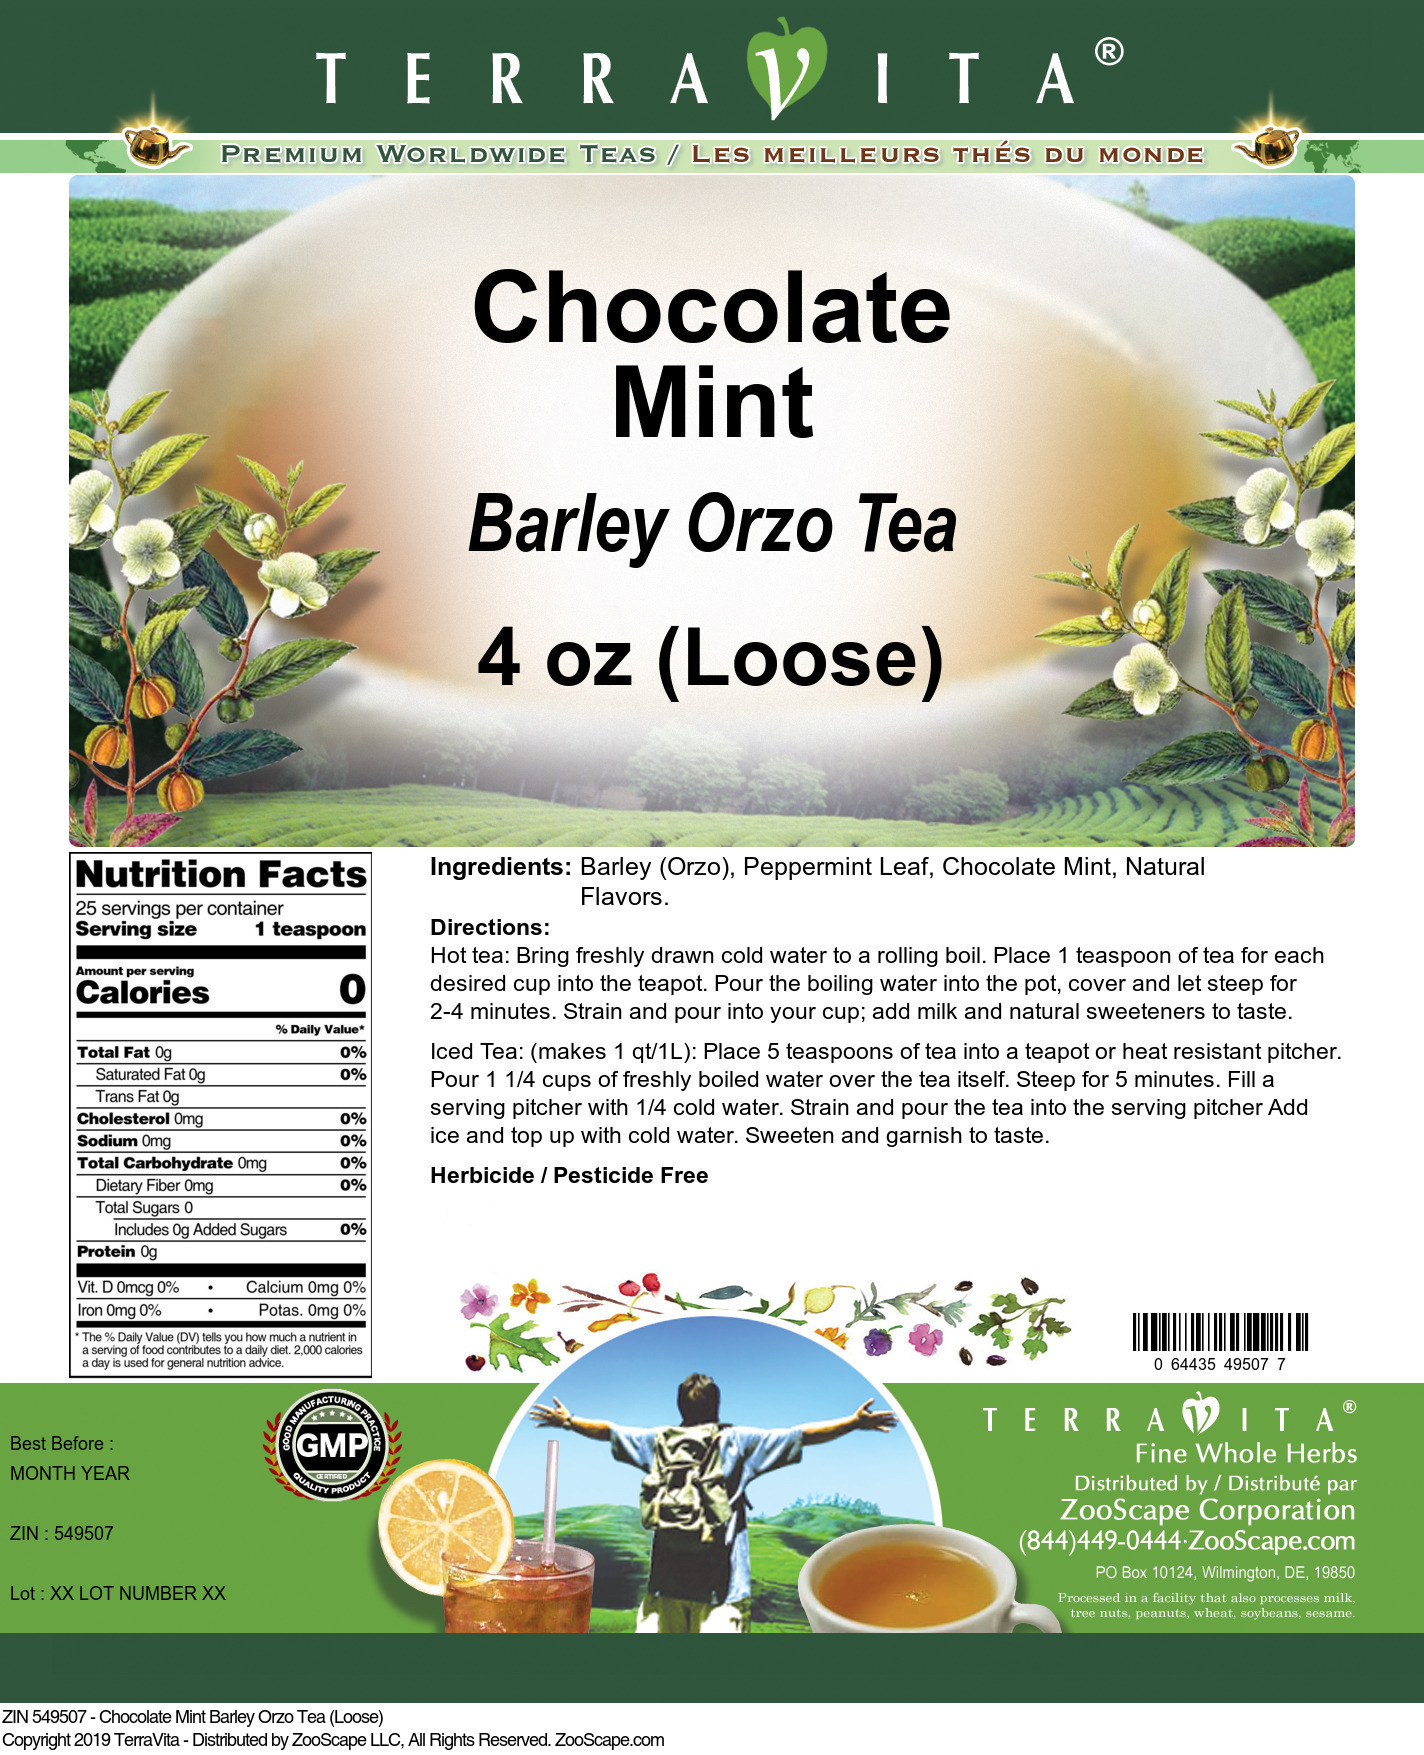 Chocolate Mint Barley Orzo